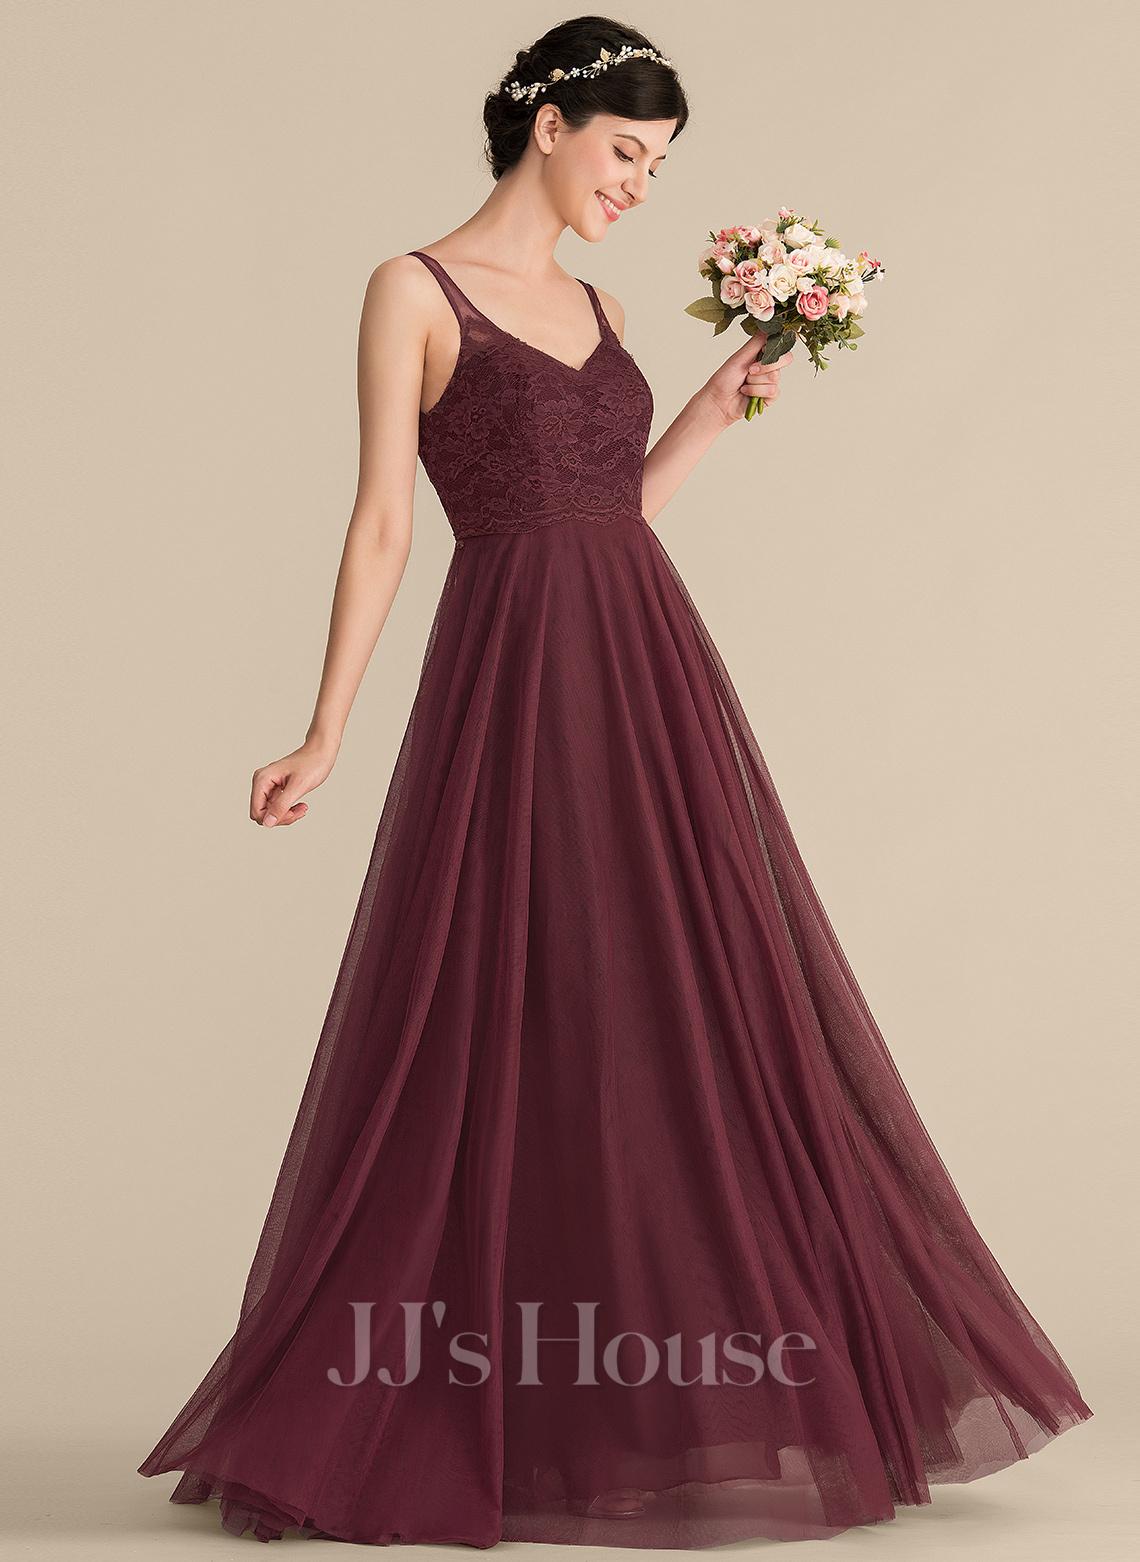 A-Line/Princess V-neck Floor-Length Tulle Lace Bridesmaid Dress